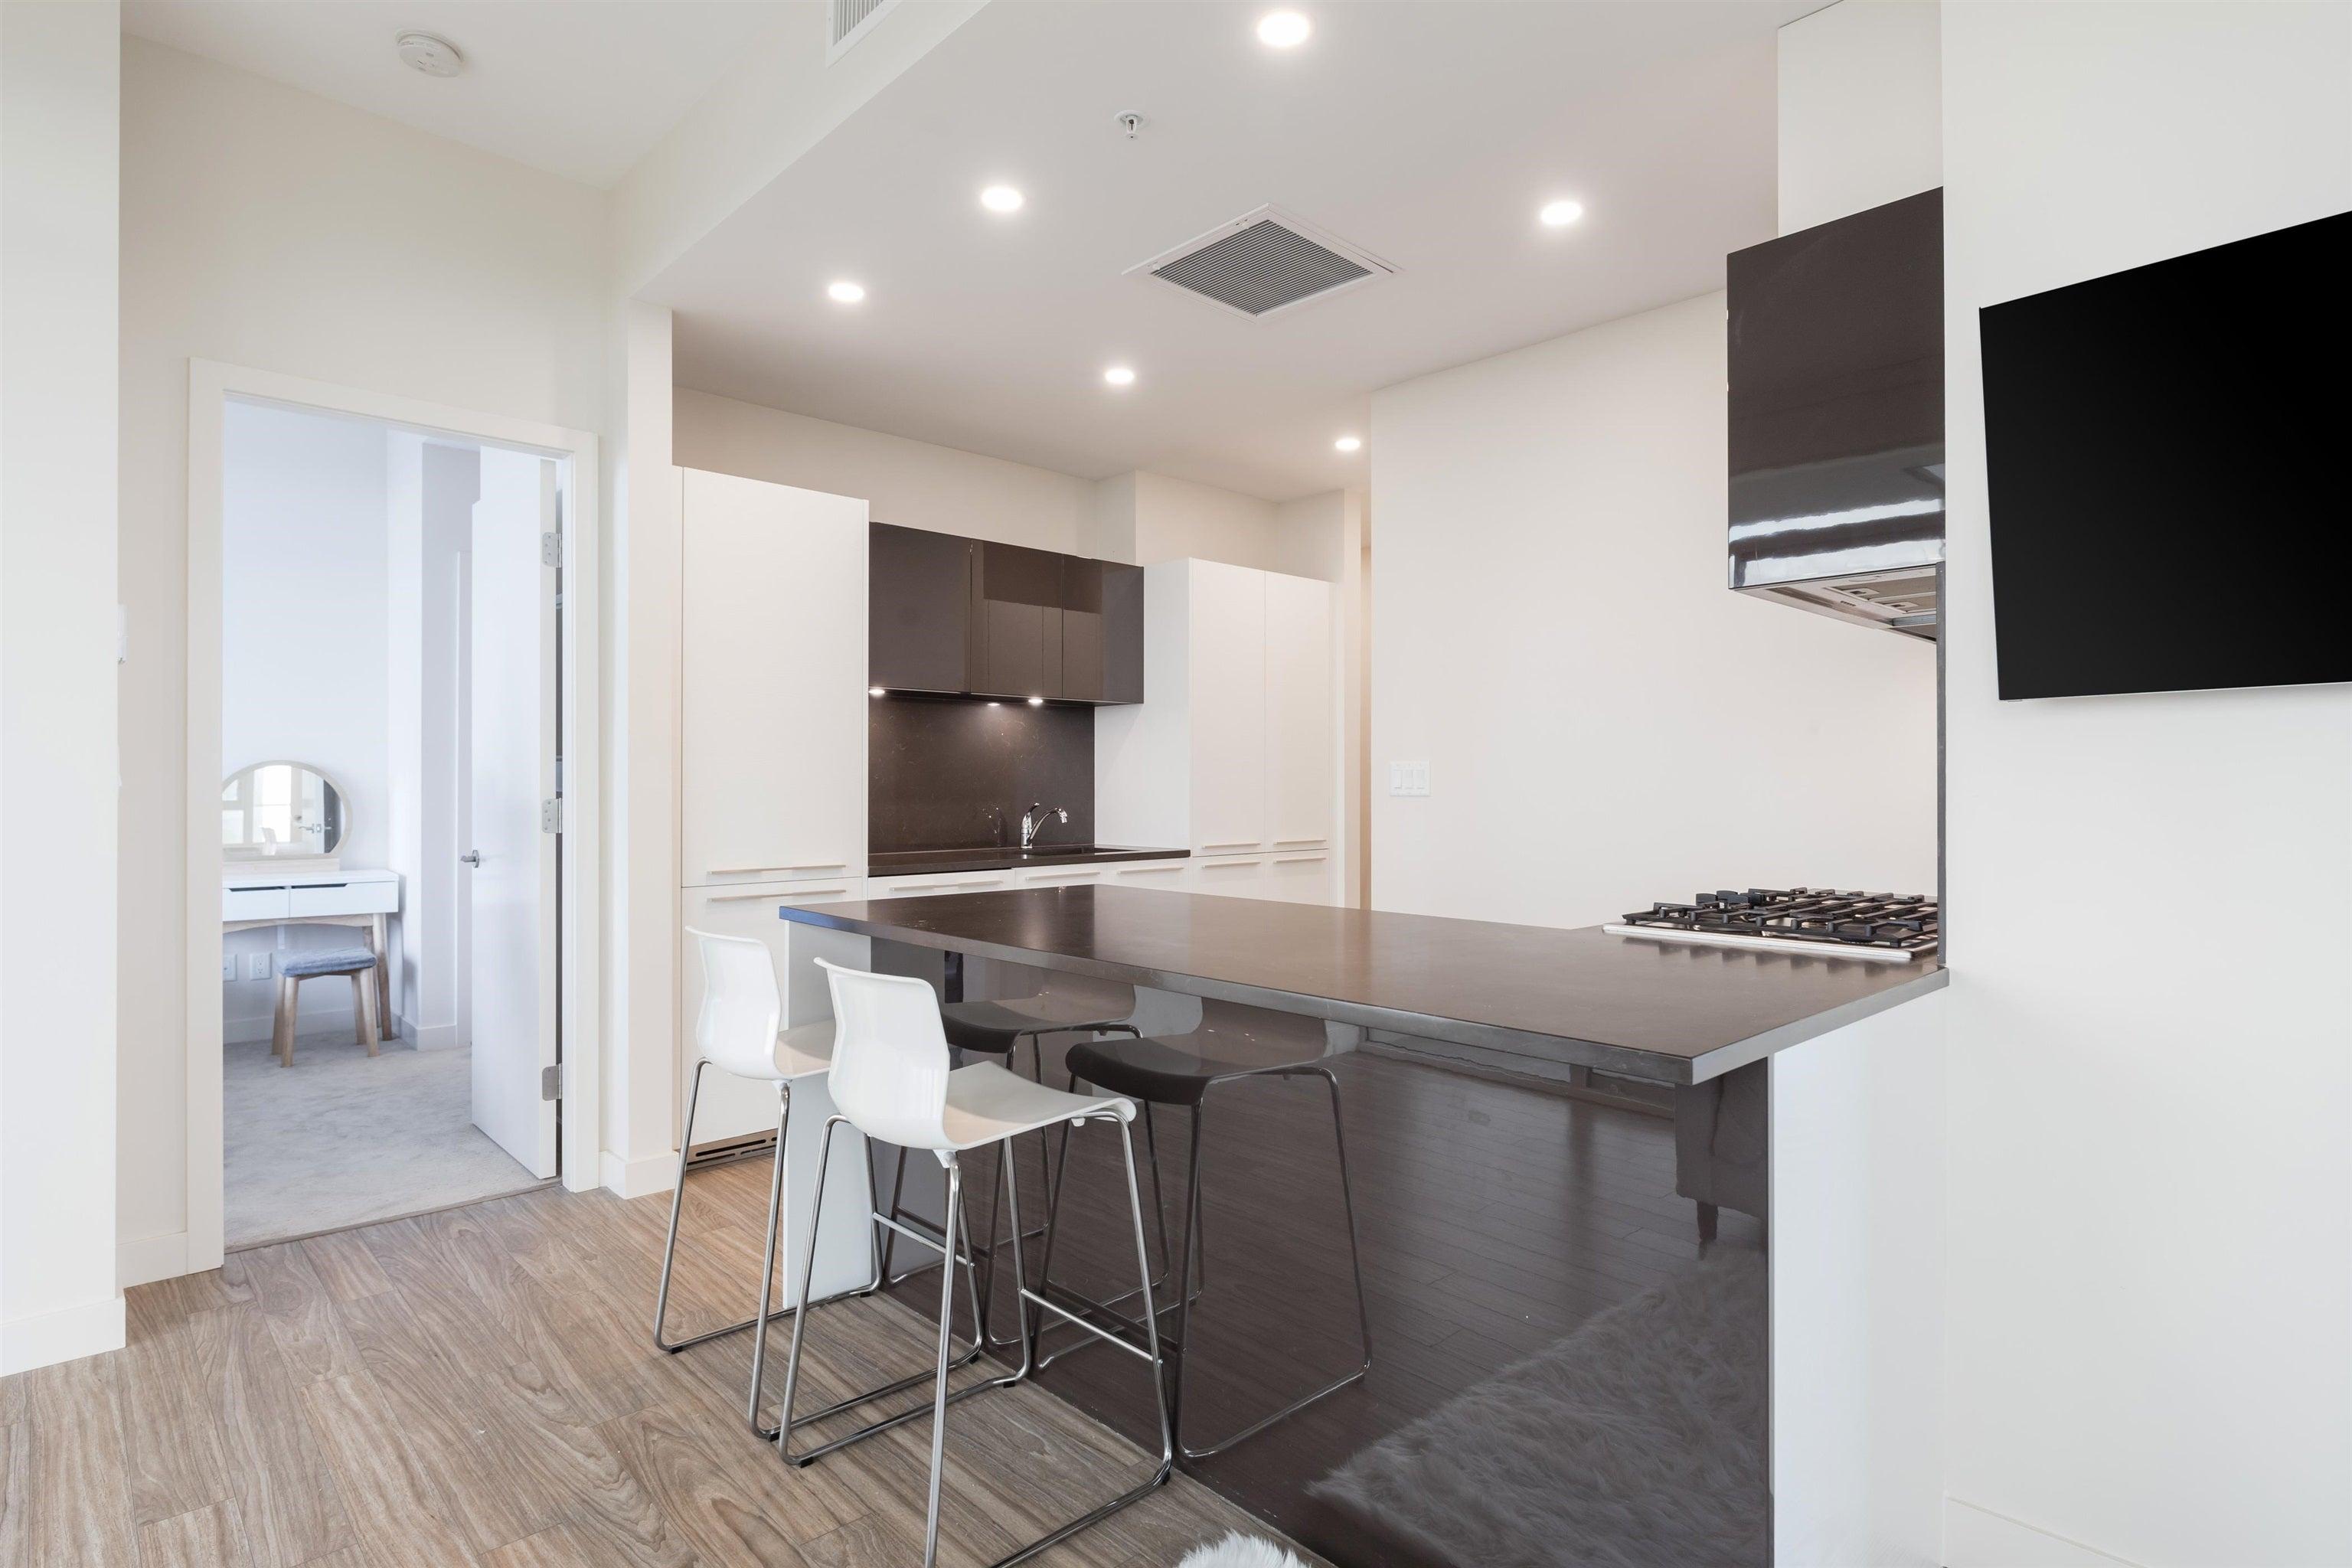 2206 6383 MCKAY AVENUE - Metrotown Apartment/Condo for sale, 2 Bedrooms (R2625647) - #6